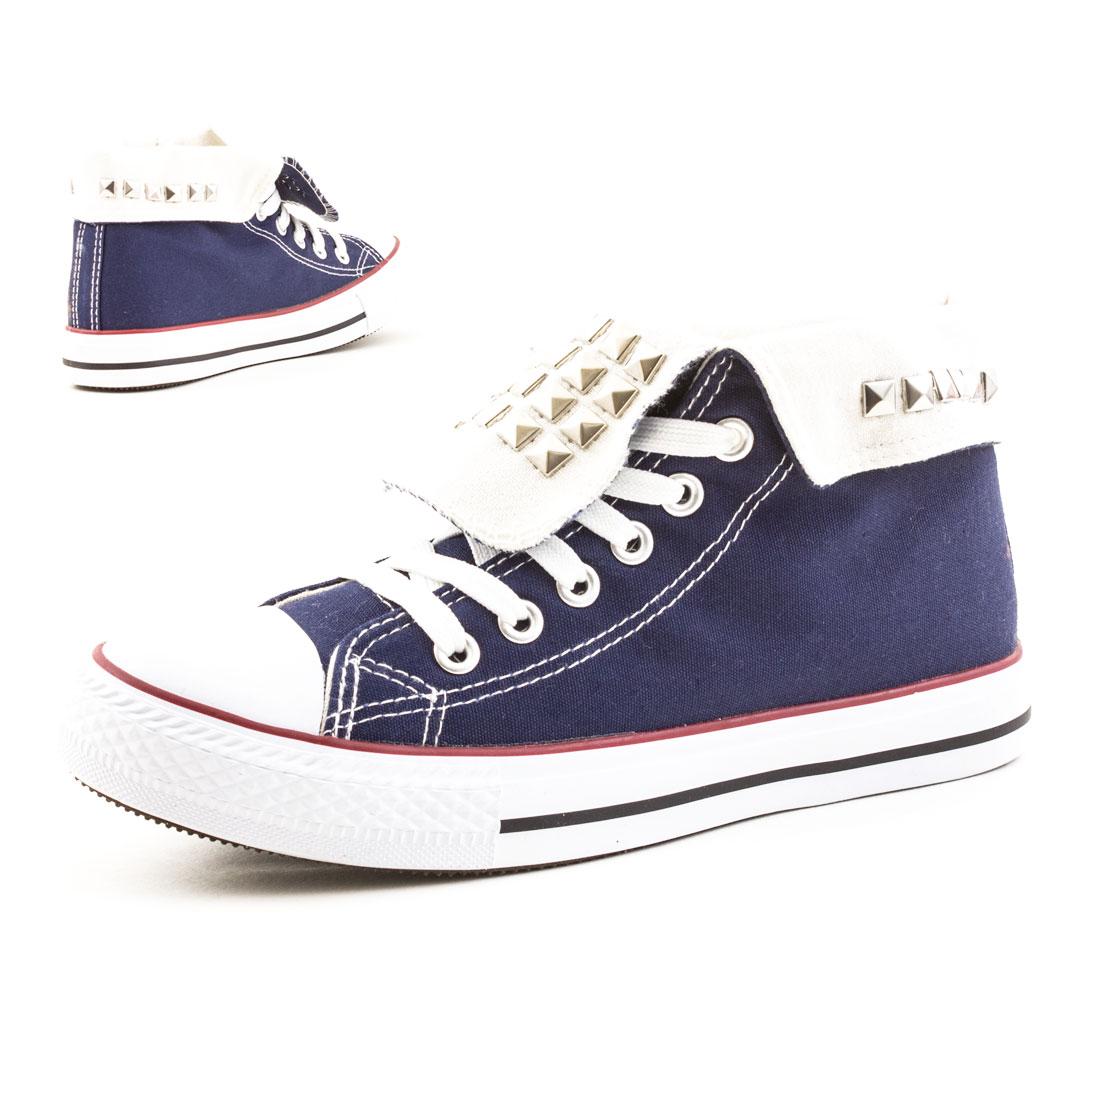 Neu Damen Nieten High Top Sneaker Canvas Turnschuhe Schuhe 36 37 38 39 40 41 fcW0y1bqM